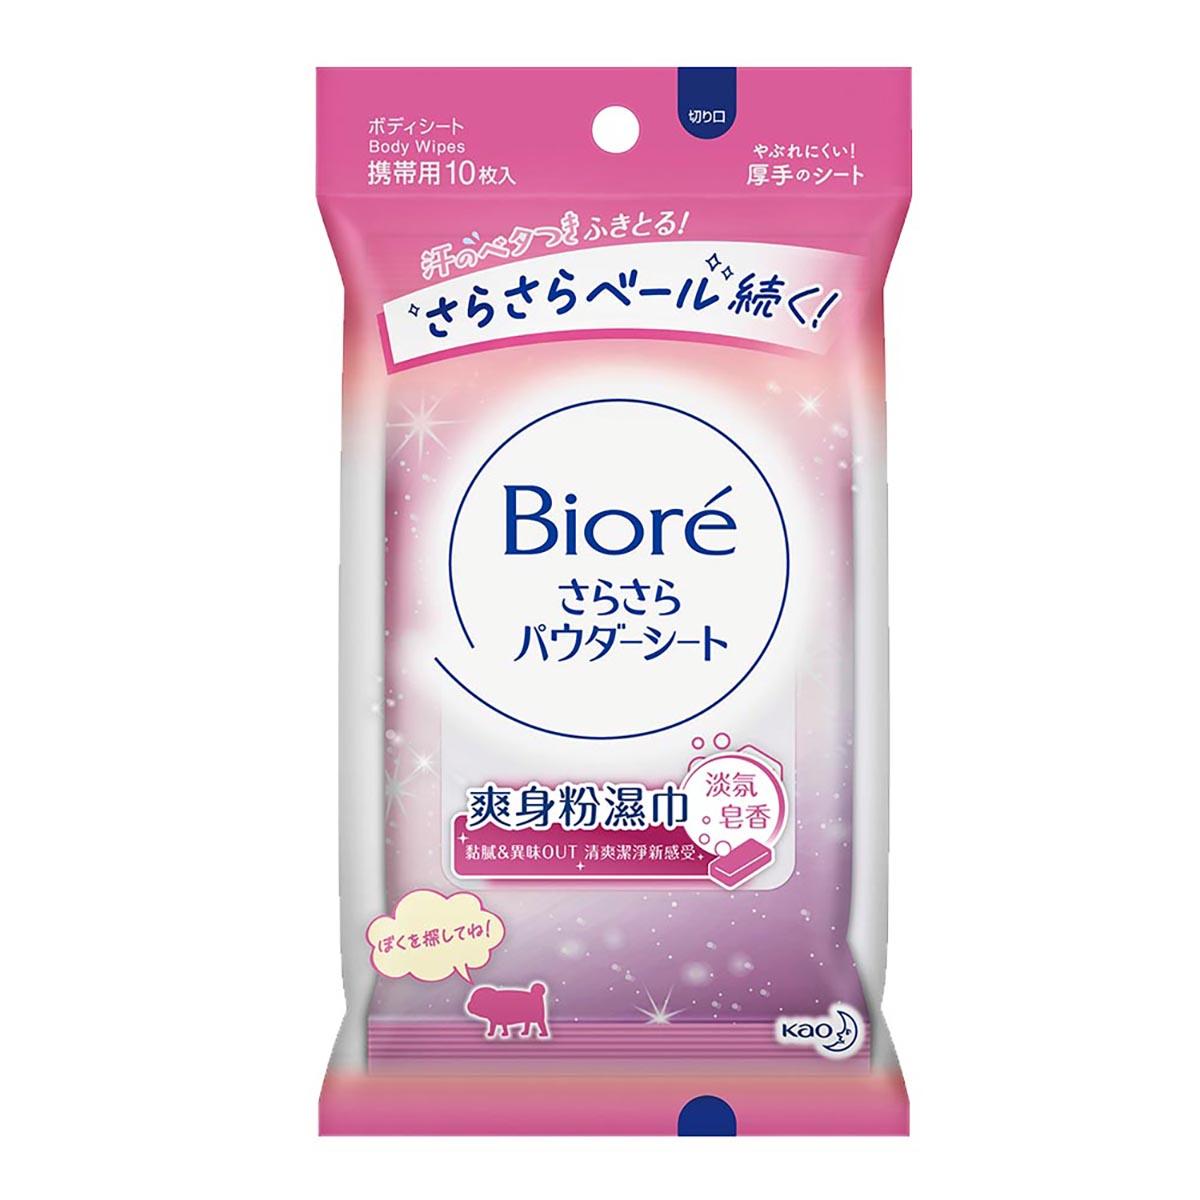 Biore蜜妮爽身粉濕巾淡氛皂香10P (隨機出貨)